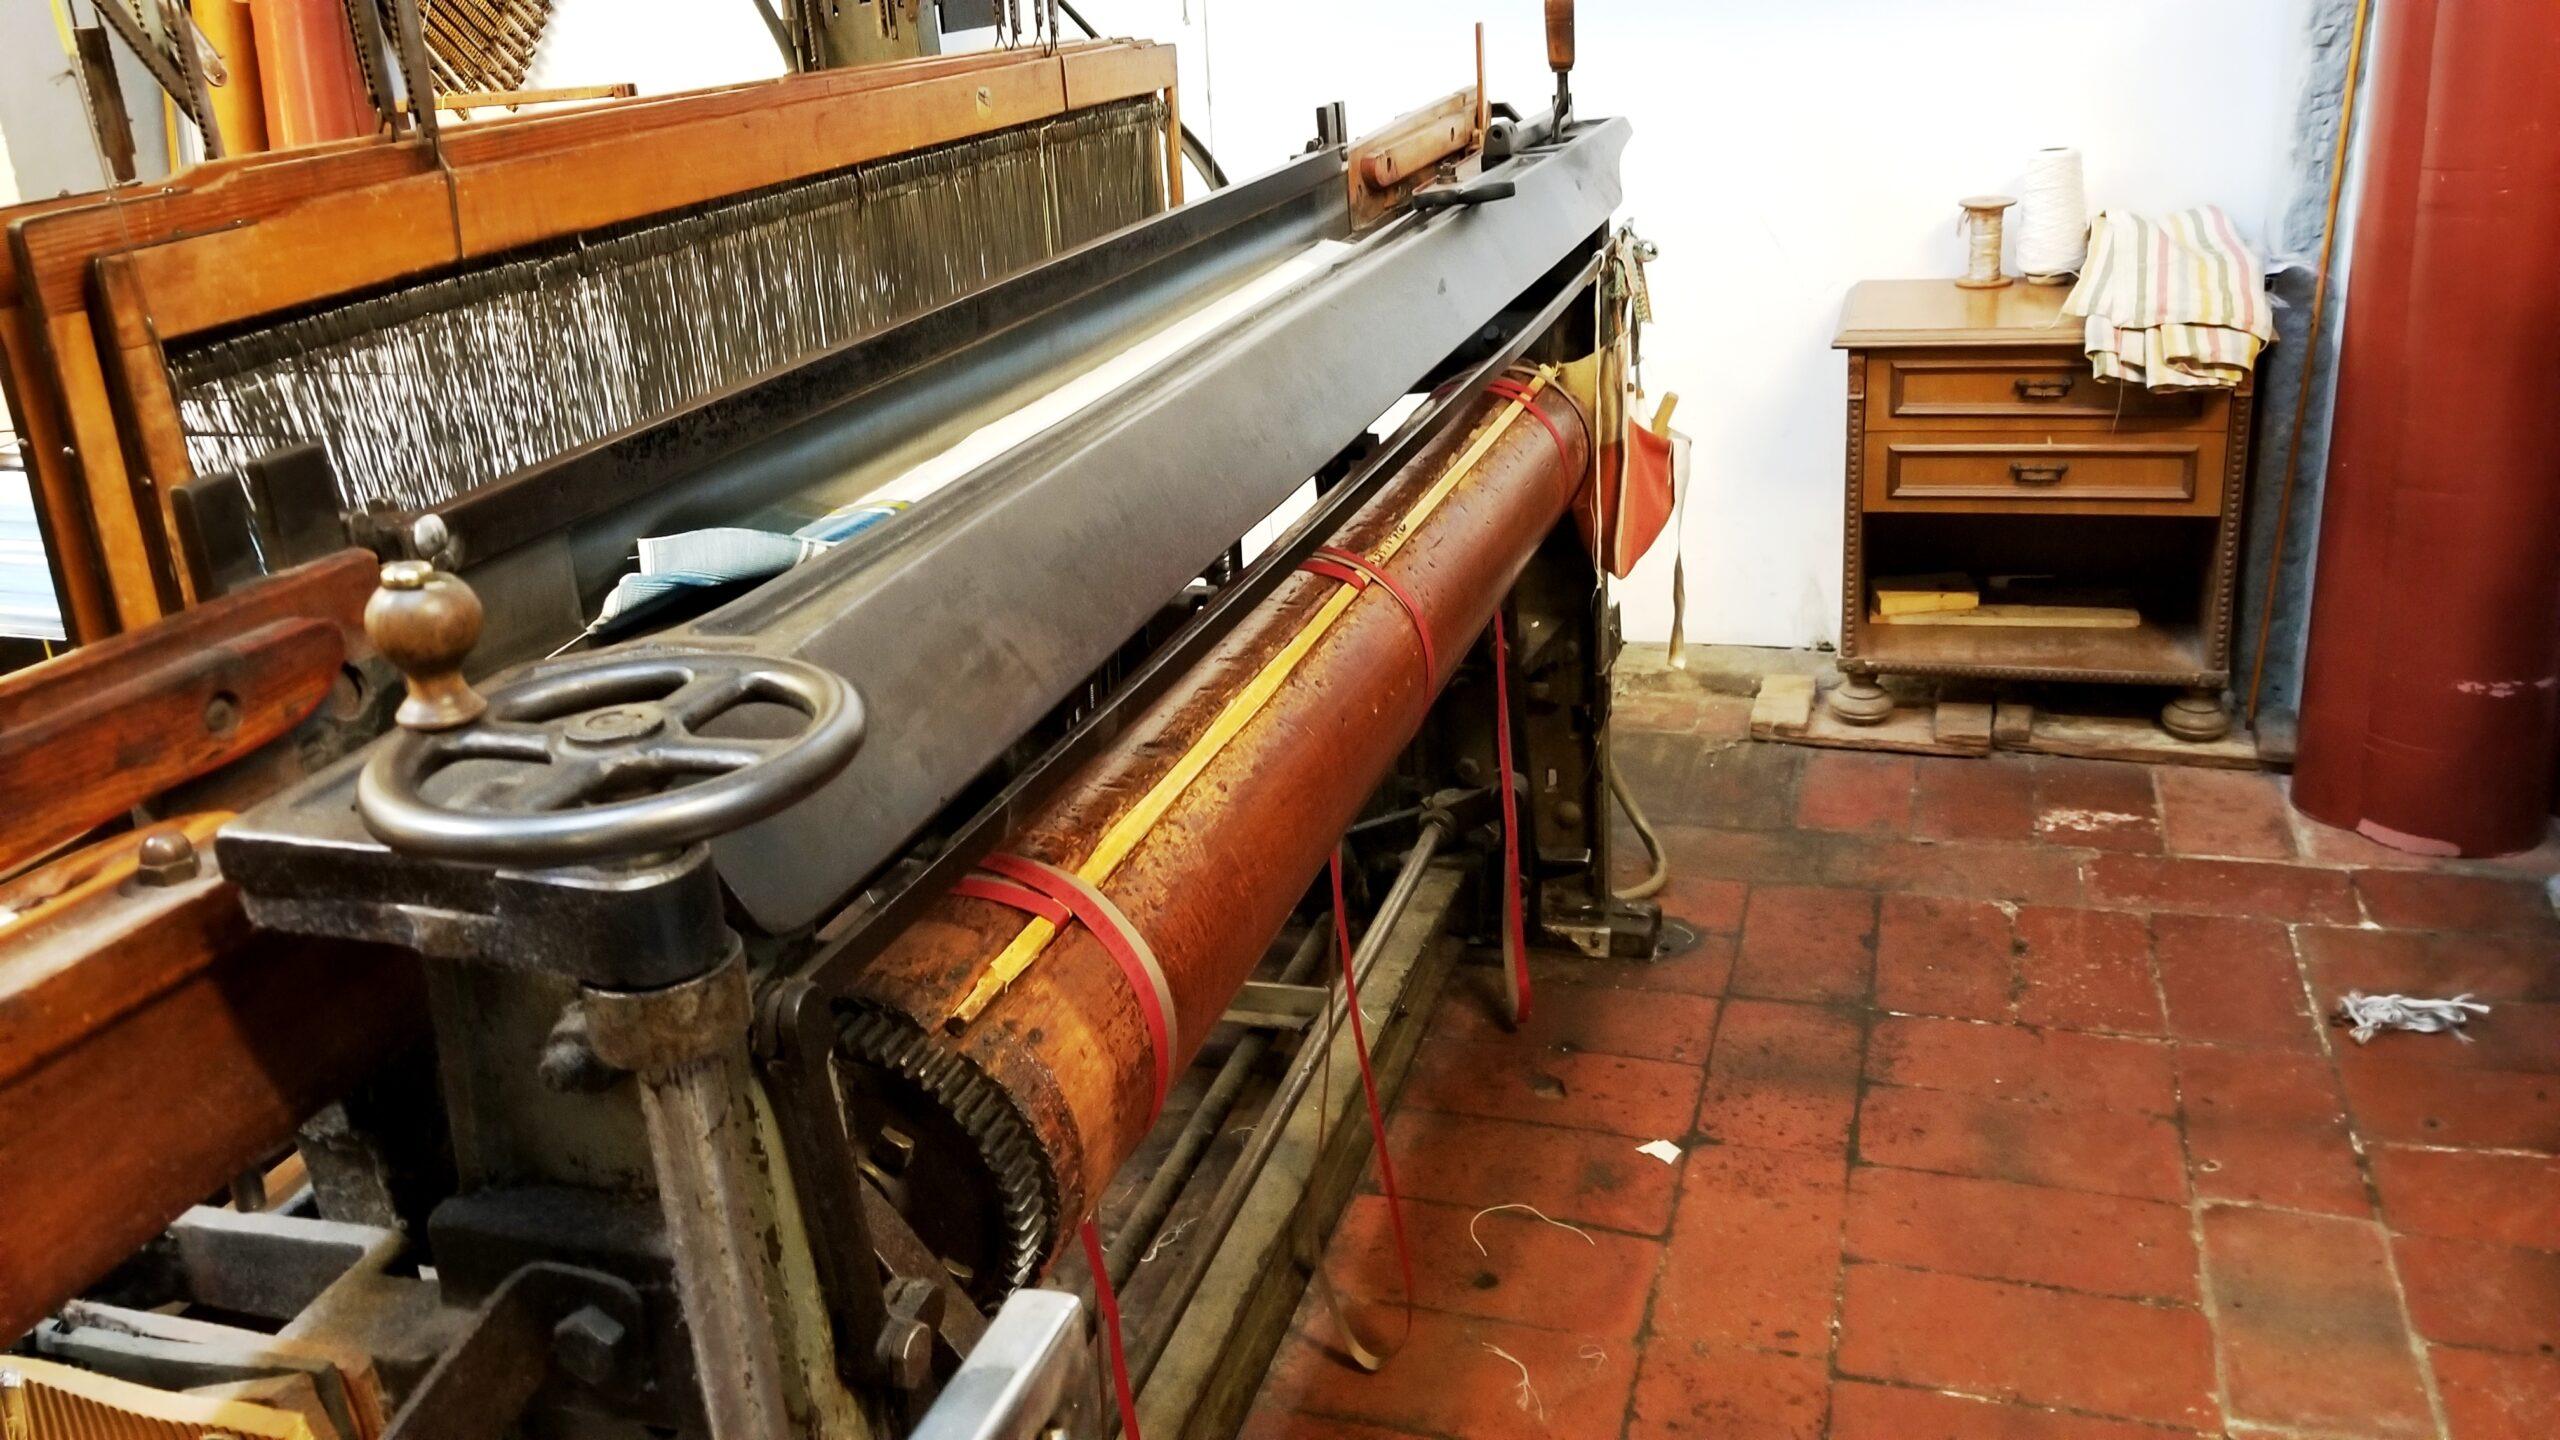 stefano ricci, antico setifico fiorentino, made in italy, milano, helen siwak, folioyvr, ecoluxluv, vancouver, bc, vancity, yvr